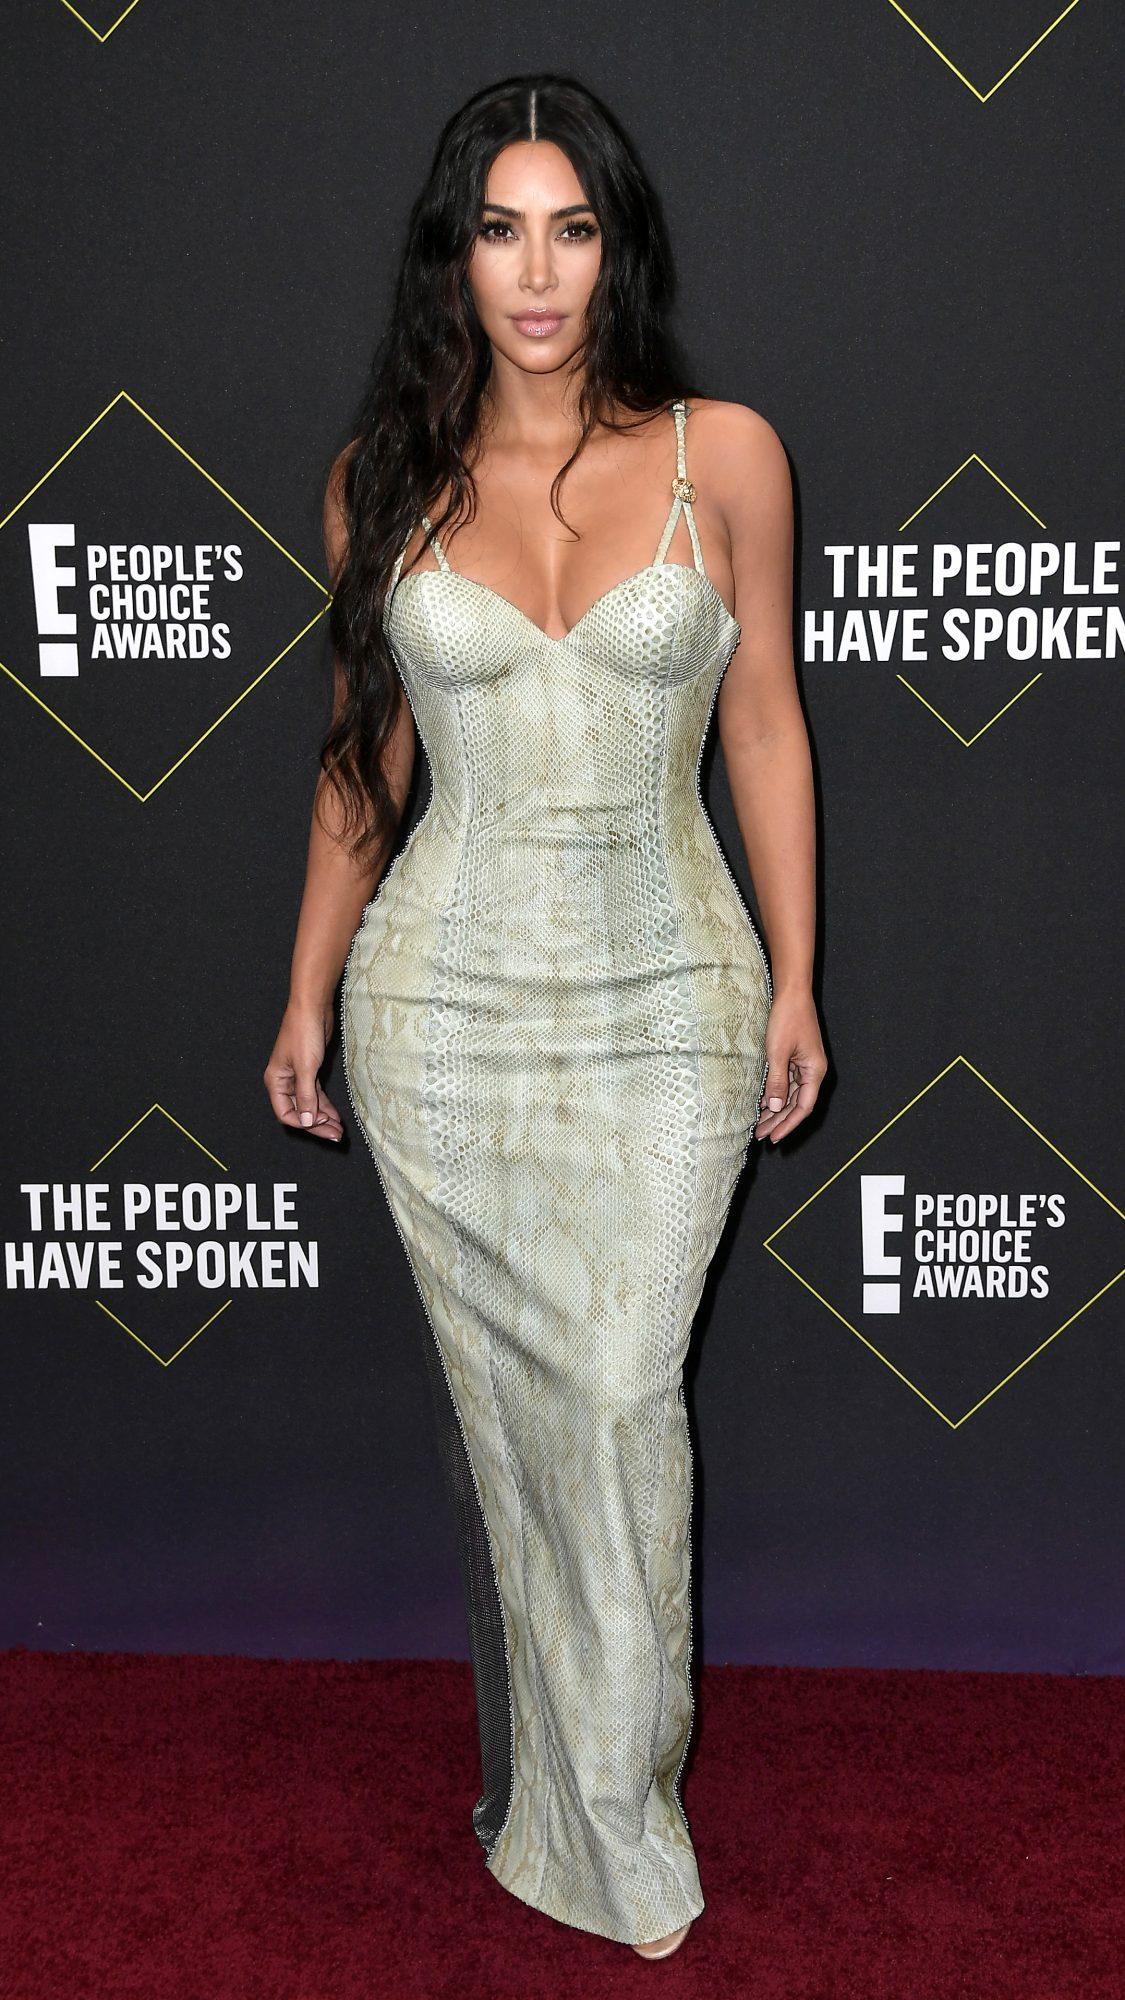 2019 E! People's Choice Awards - Social Crops